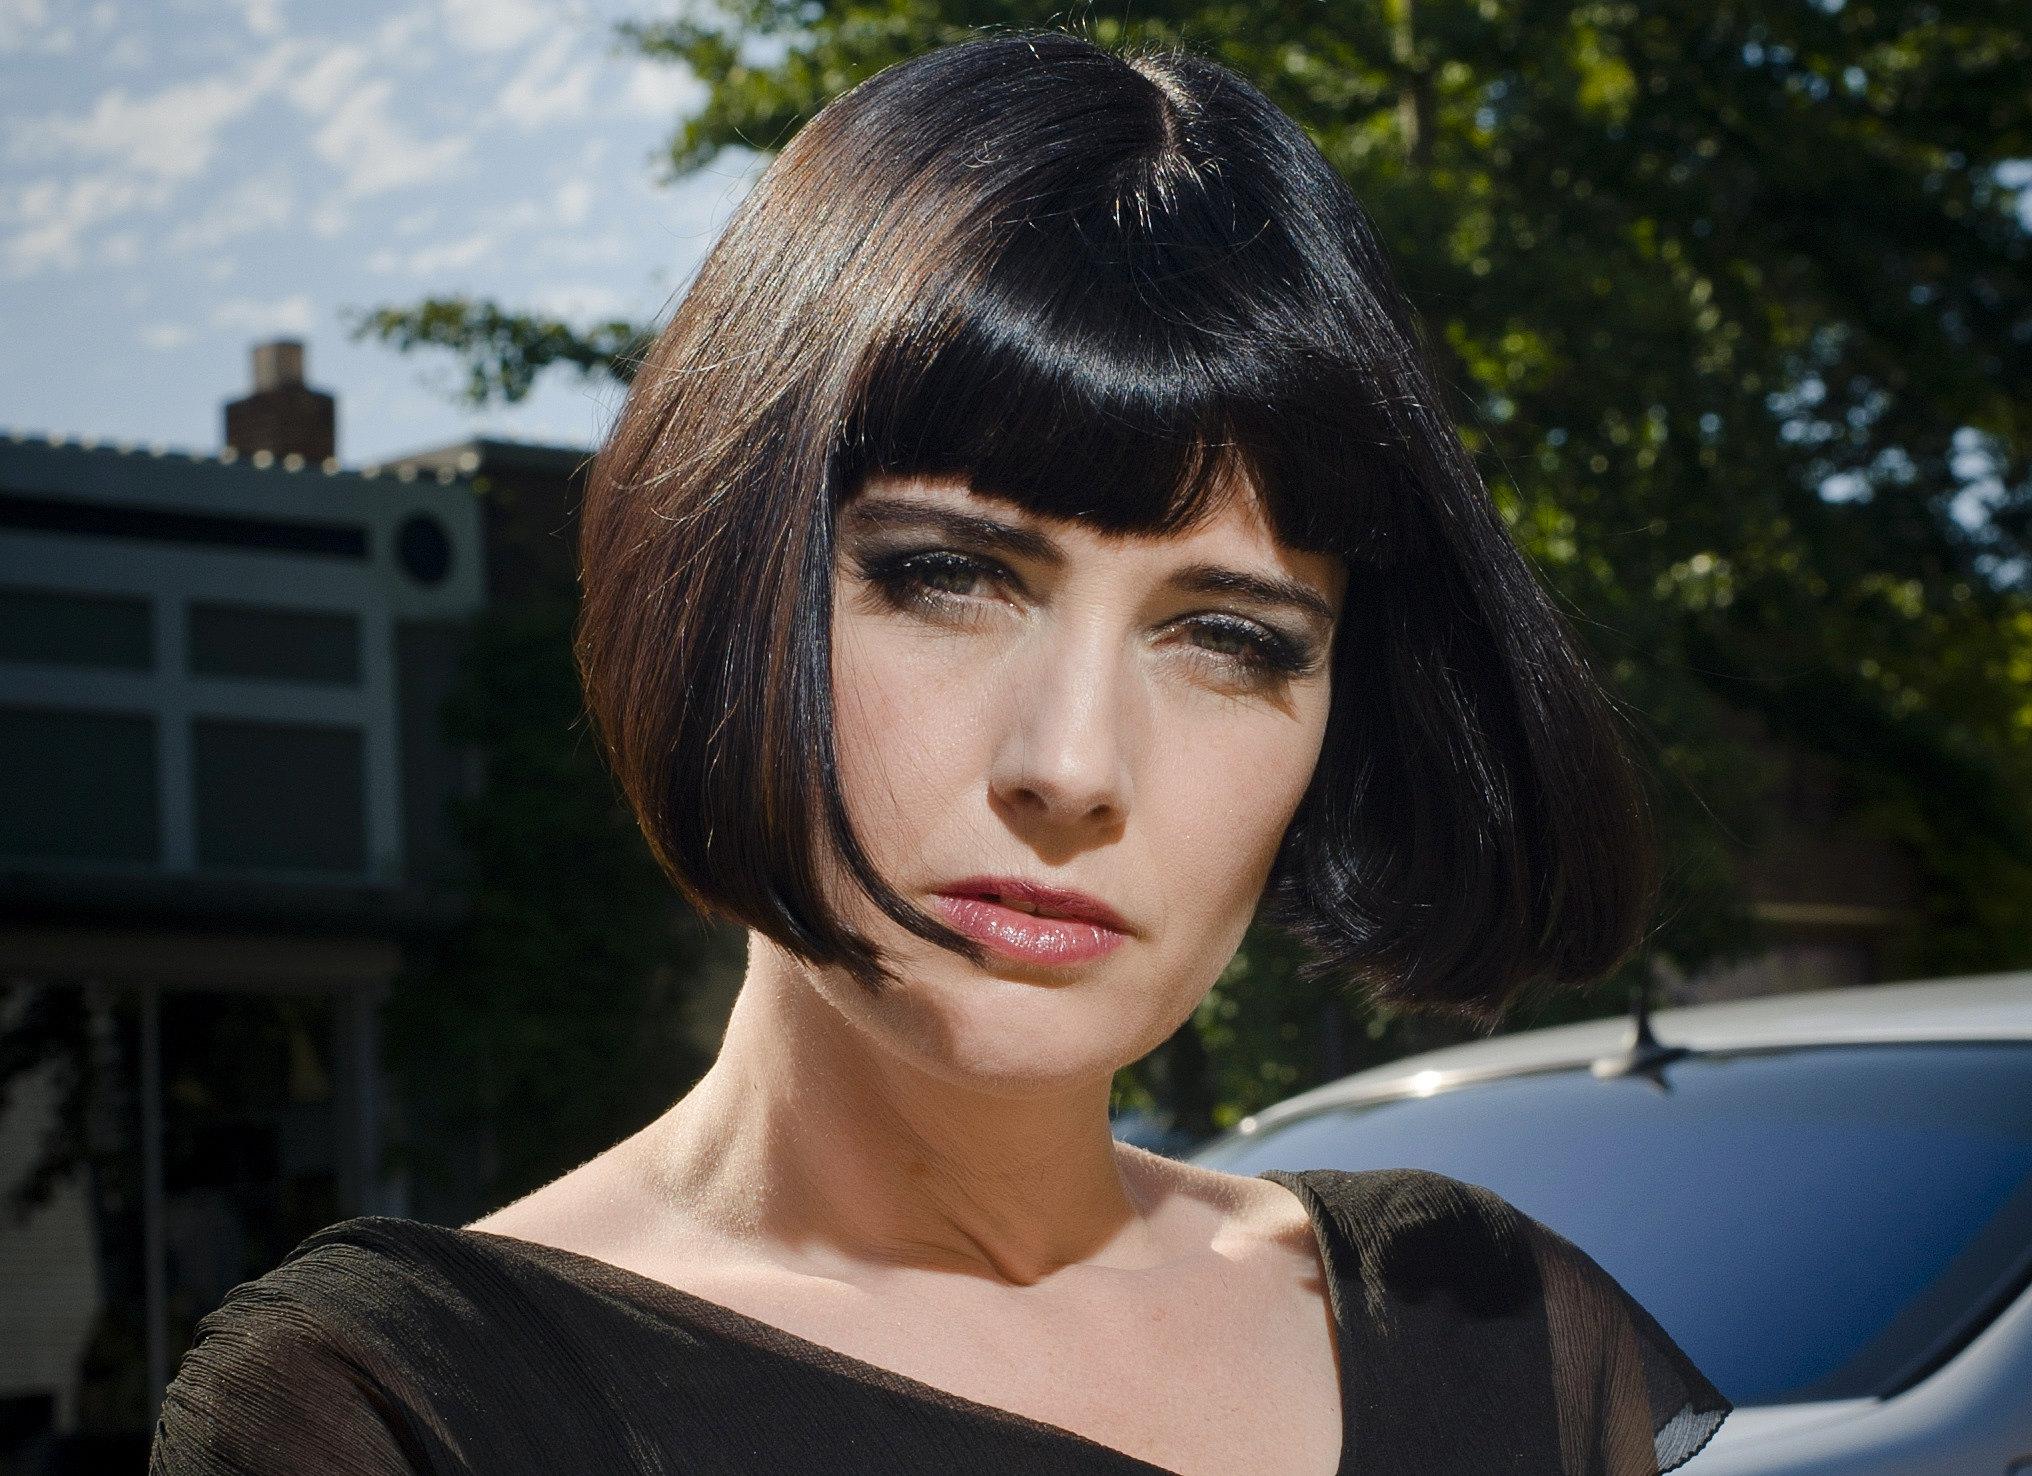 Halo designs salon halo designs hair by charlene bancel for Halo salon vancouver